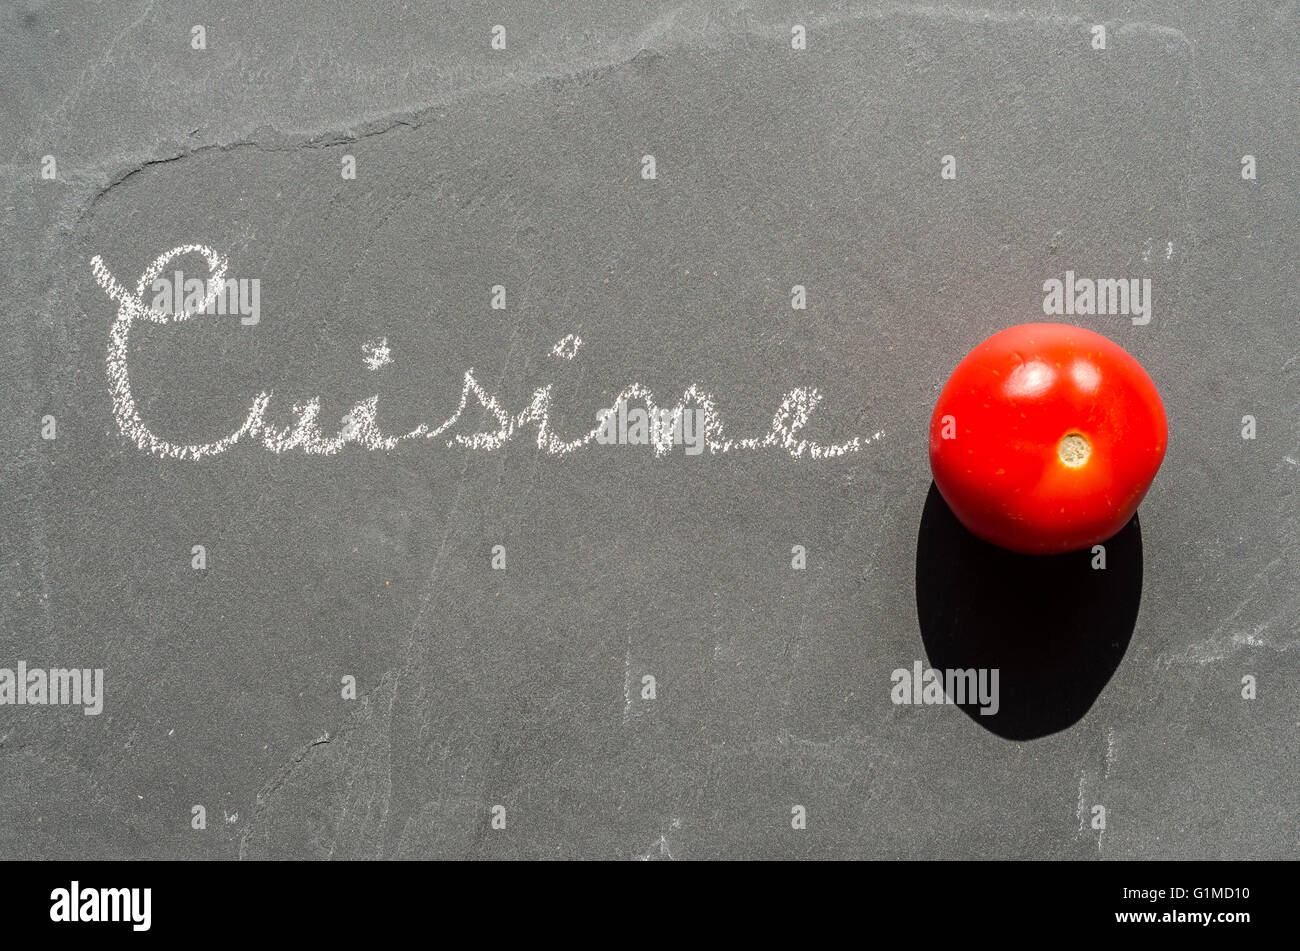 Tomate cerise sur ardoise - Stock Image